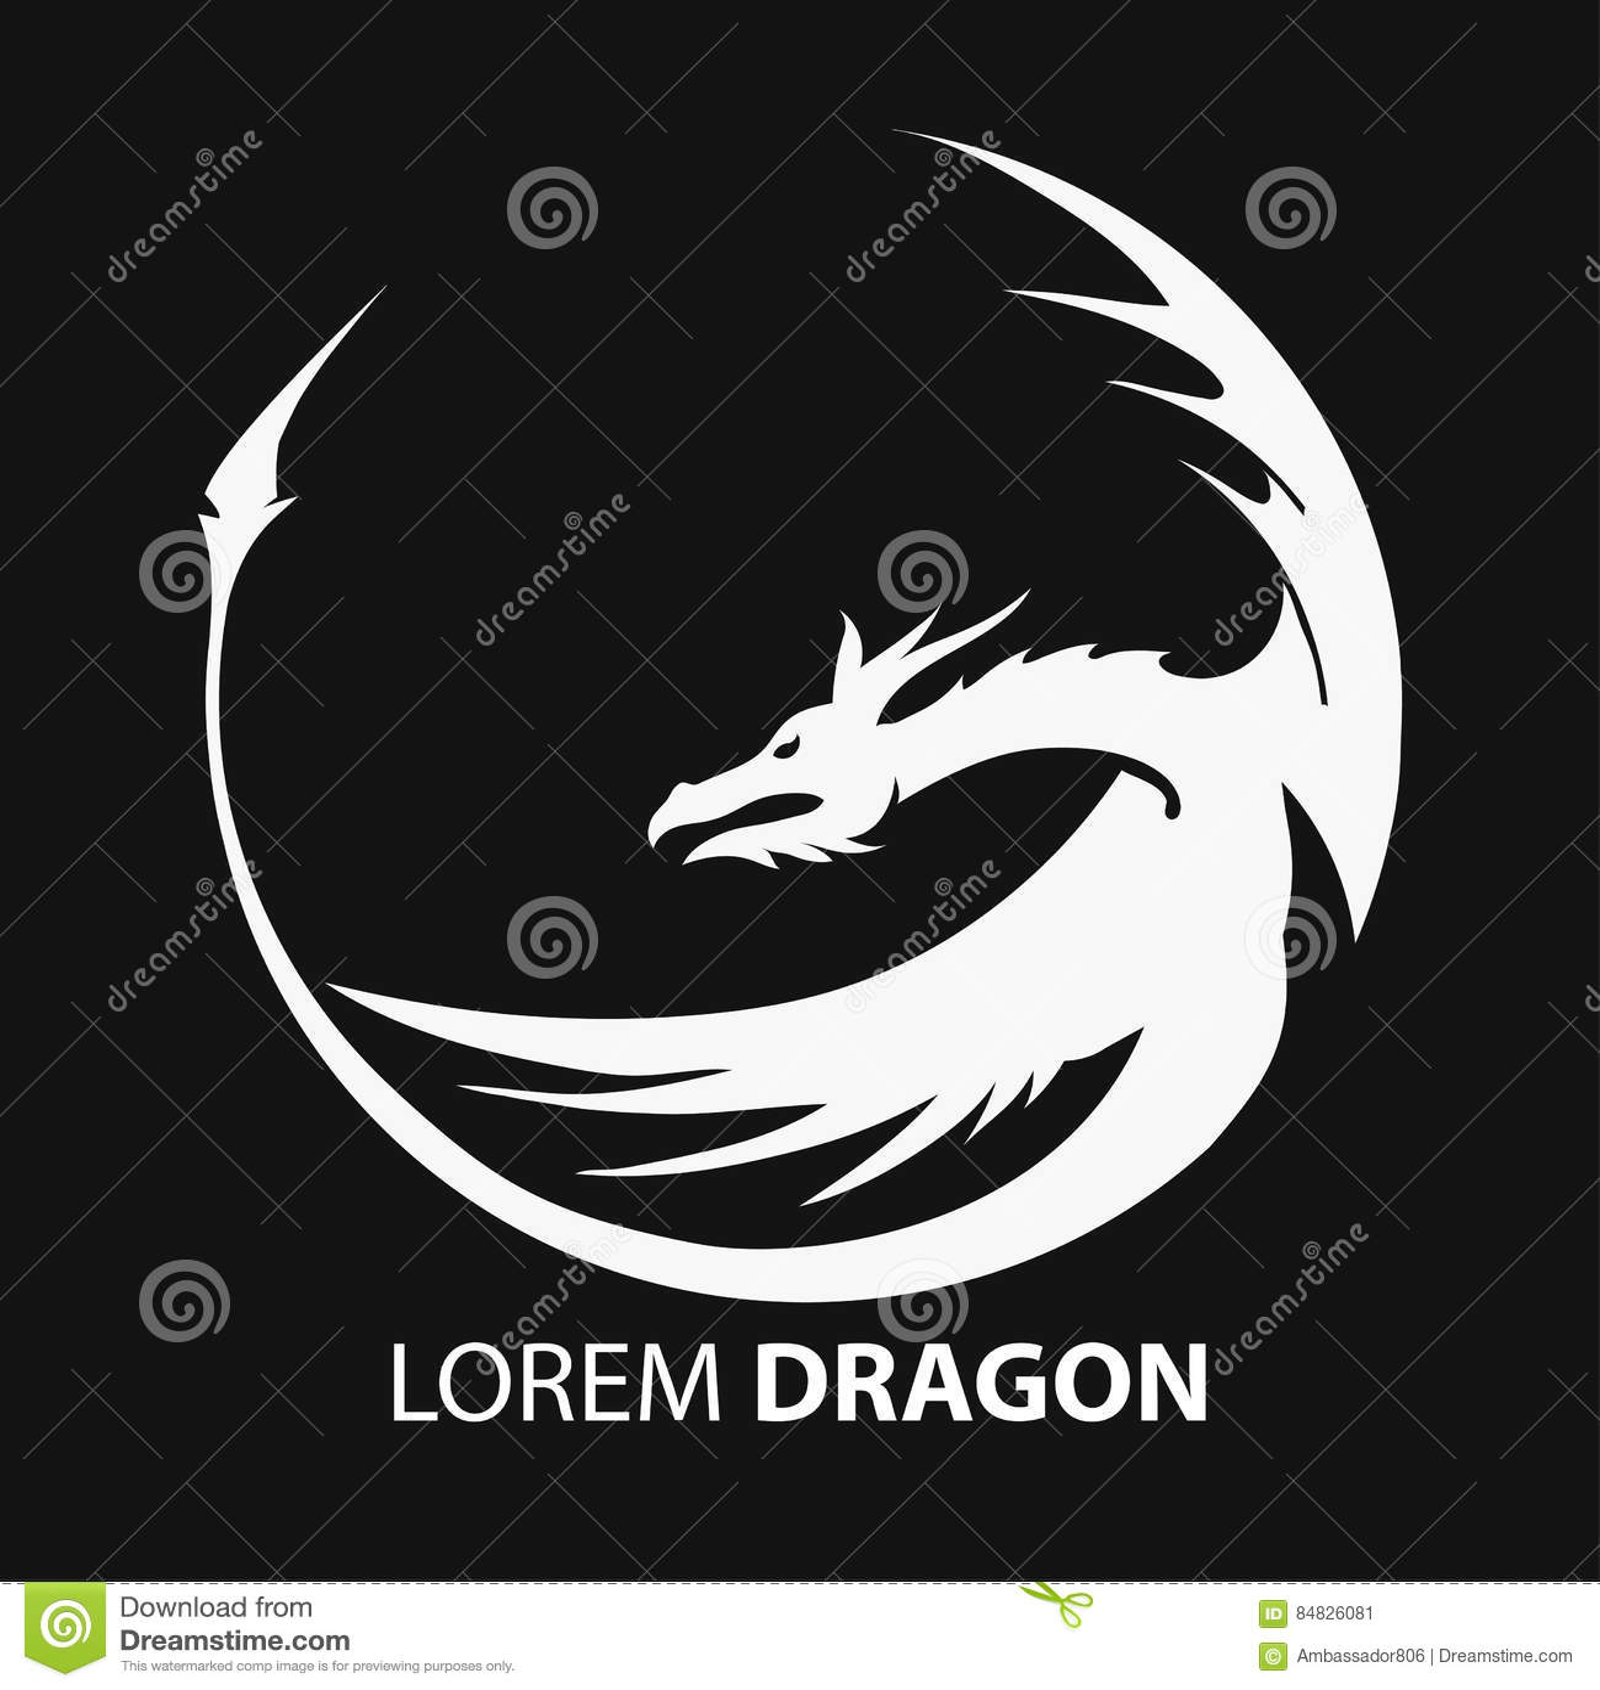 Dragon Vector Silhouette Stock Vector - Image: 84826081